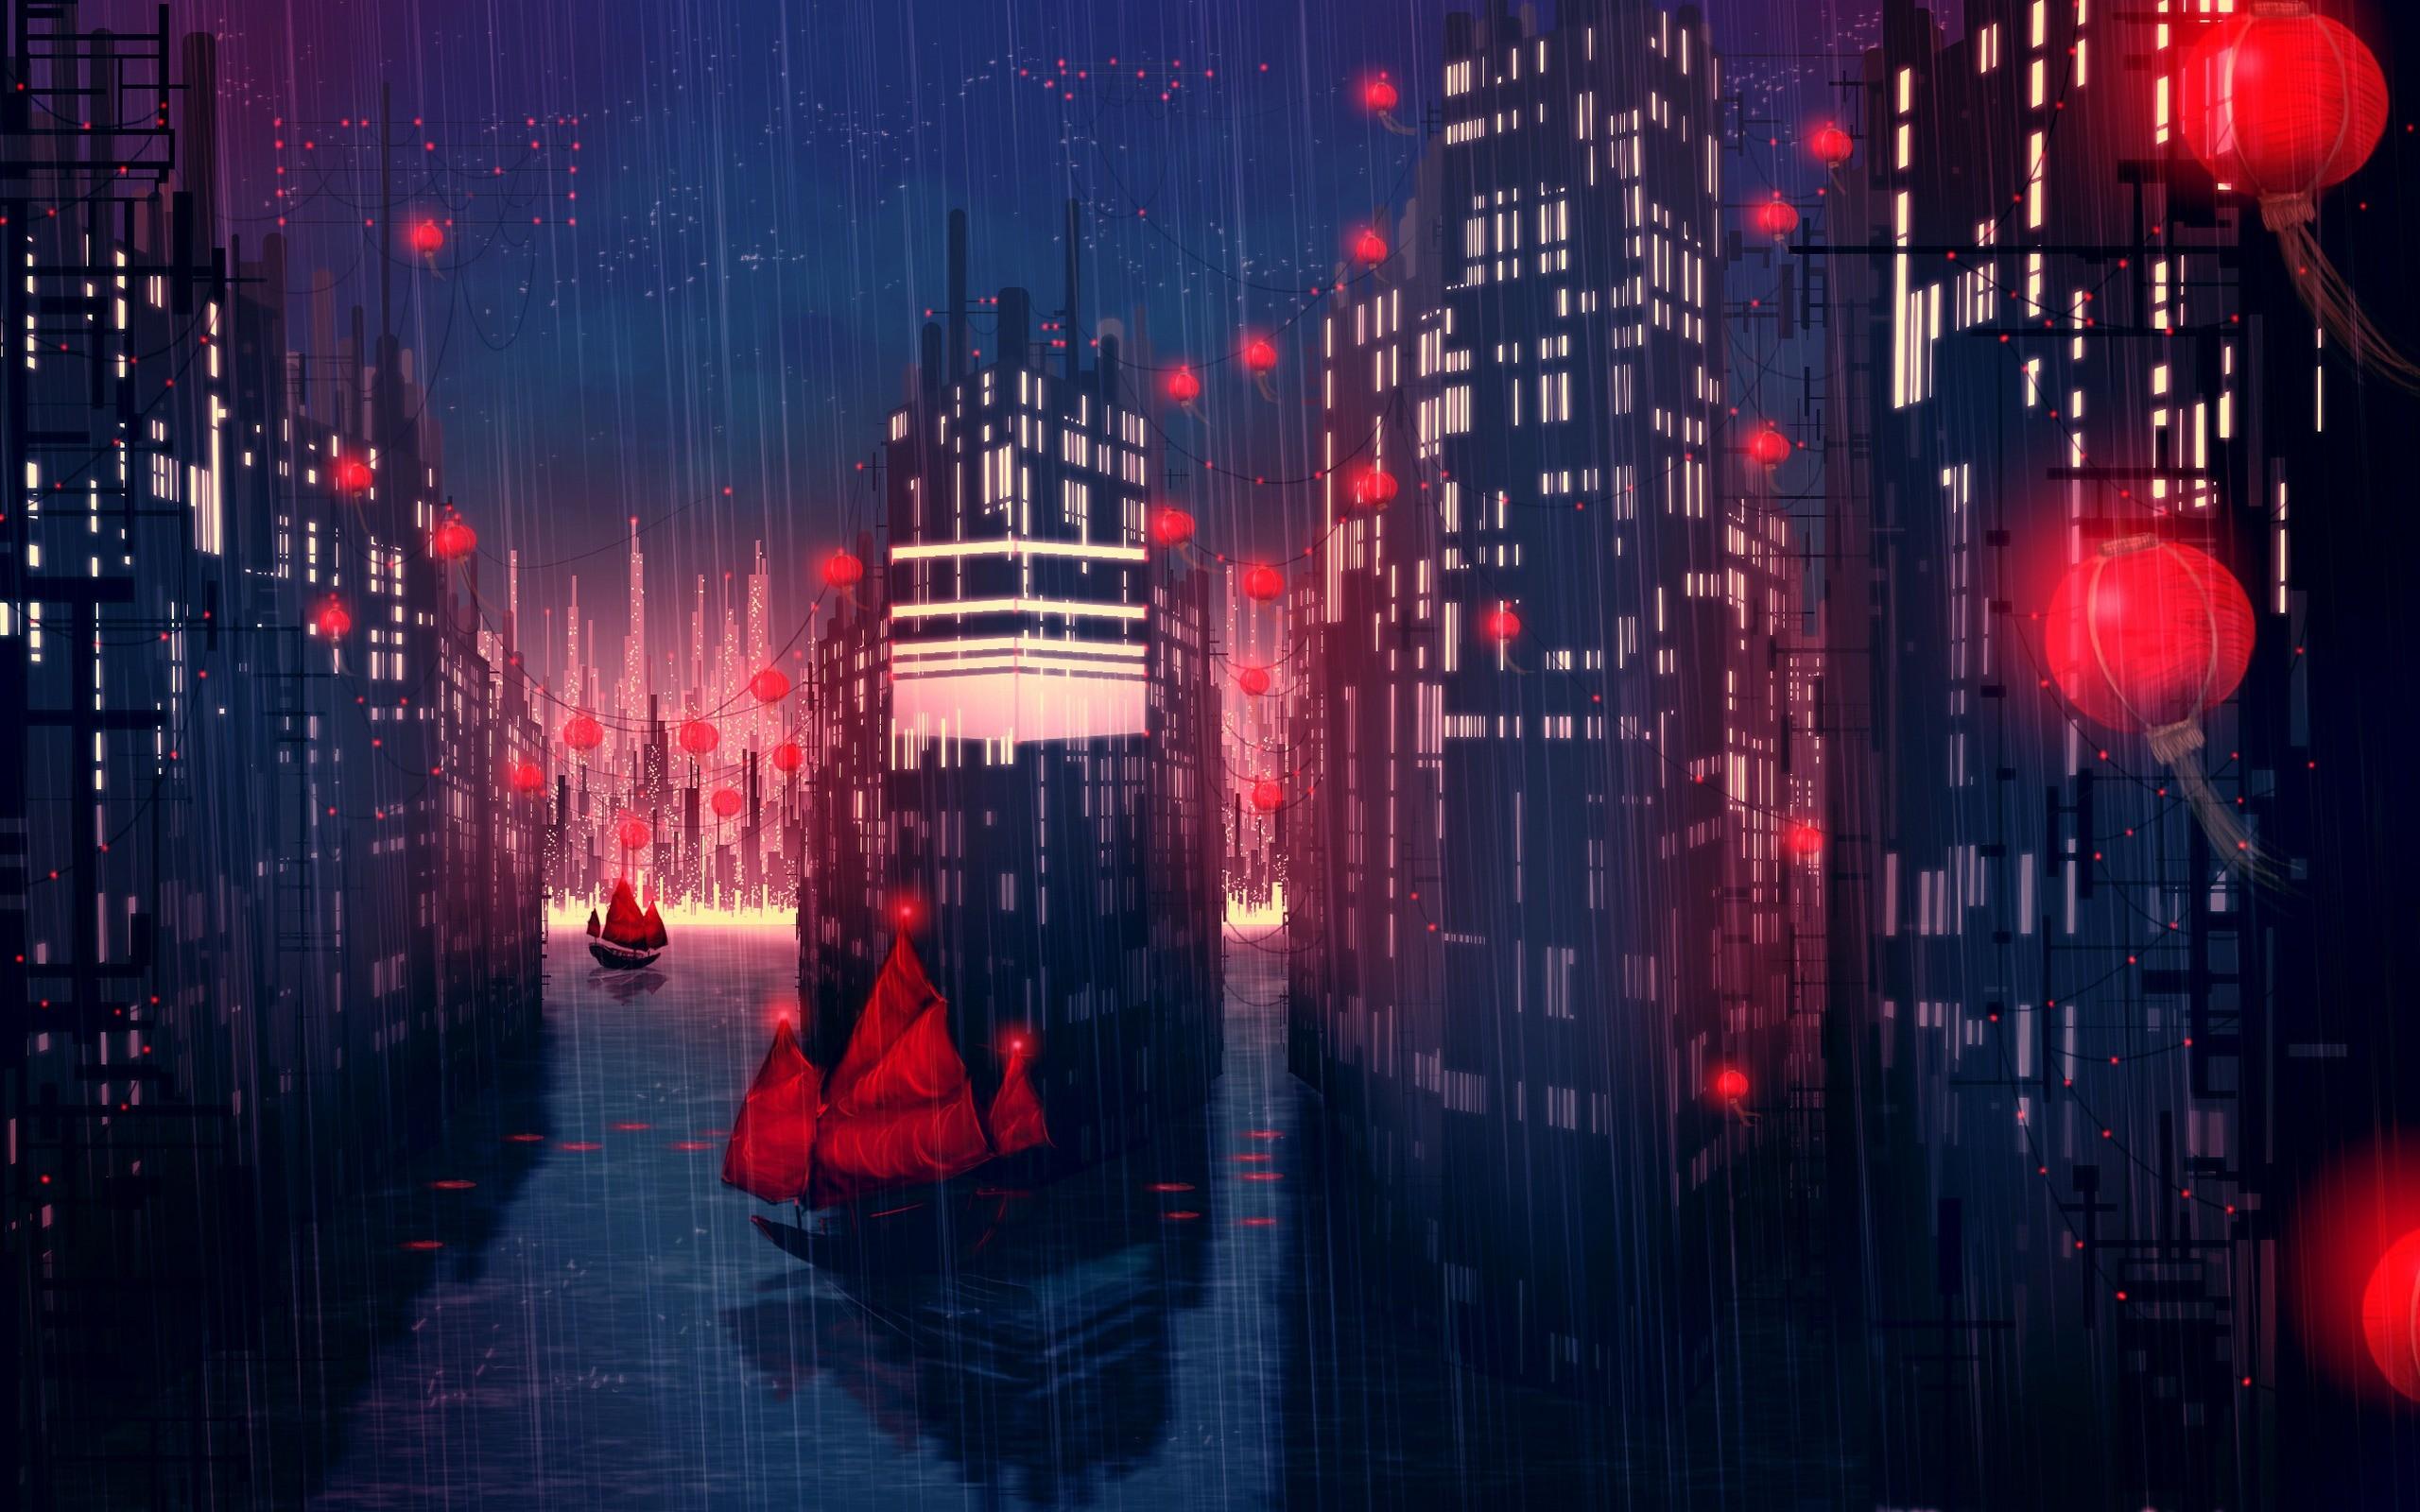 Night Anime Scenery Wallpaper 6